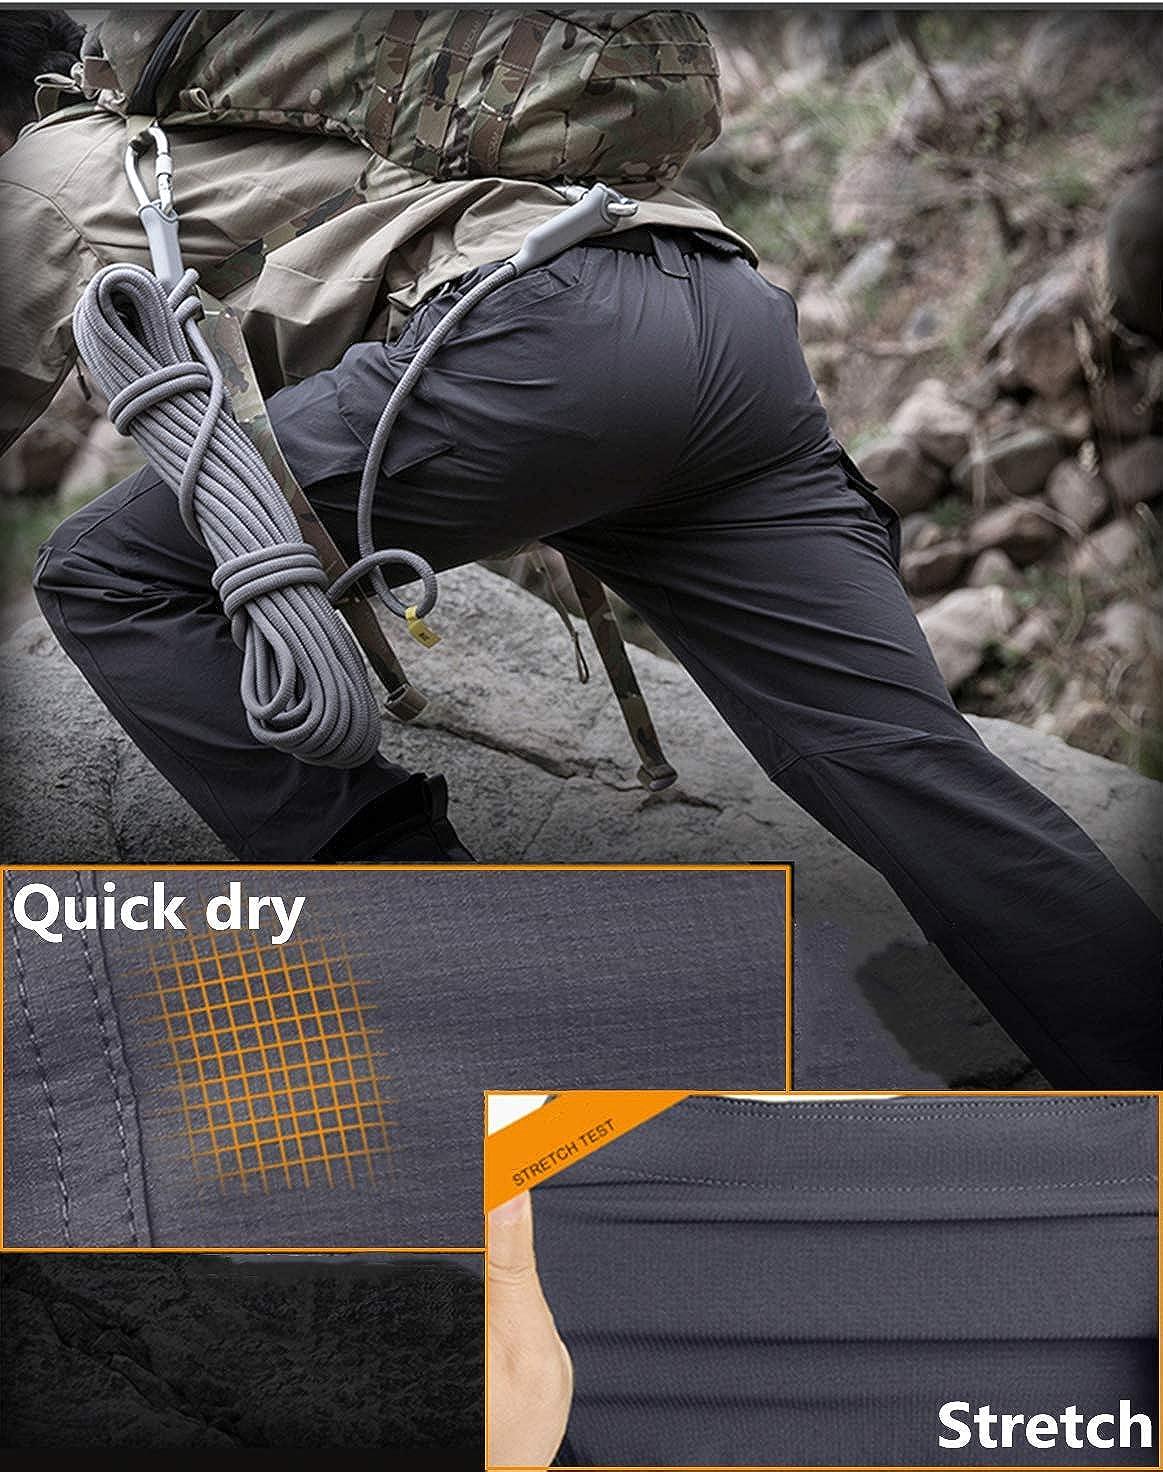 Mens Tactical Cargo Work Trousers Survivor Outdoor Waterproof Military Combat Pants with Elastic Waist. Soldier Tactical Waterproof Pants Combat Hiking Outdoor